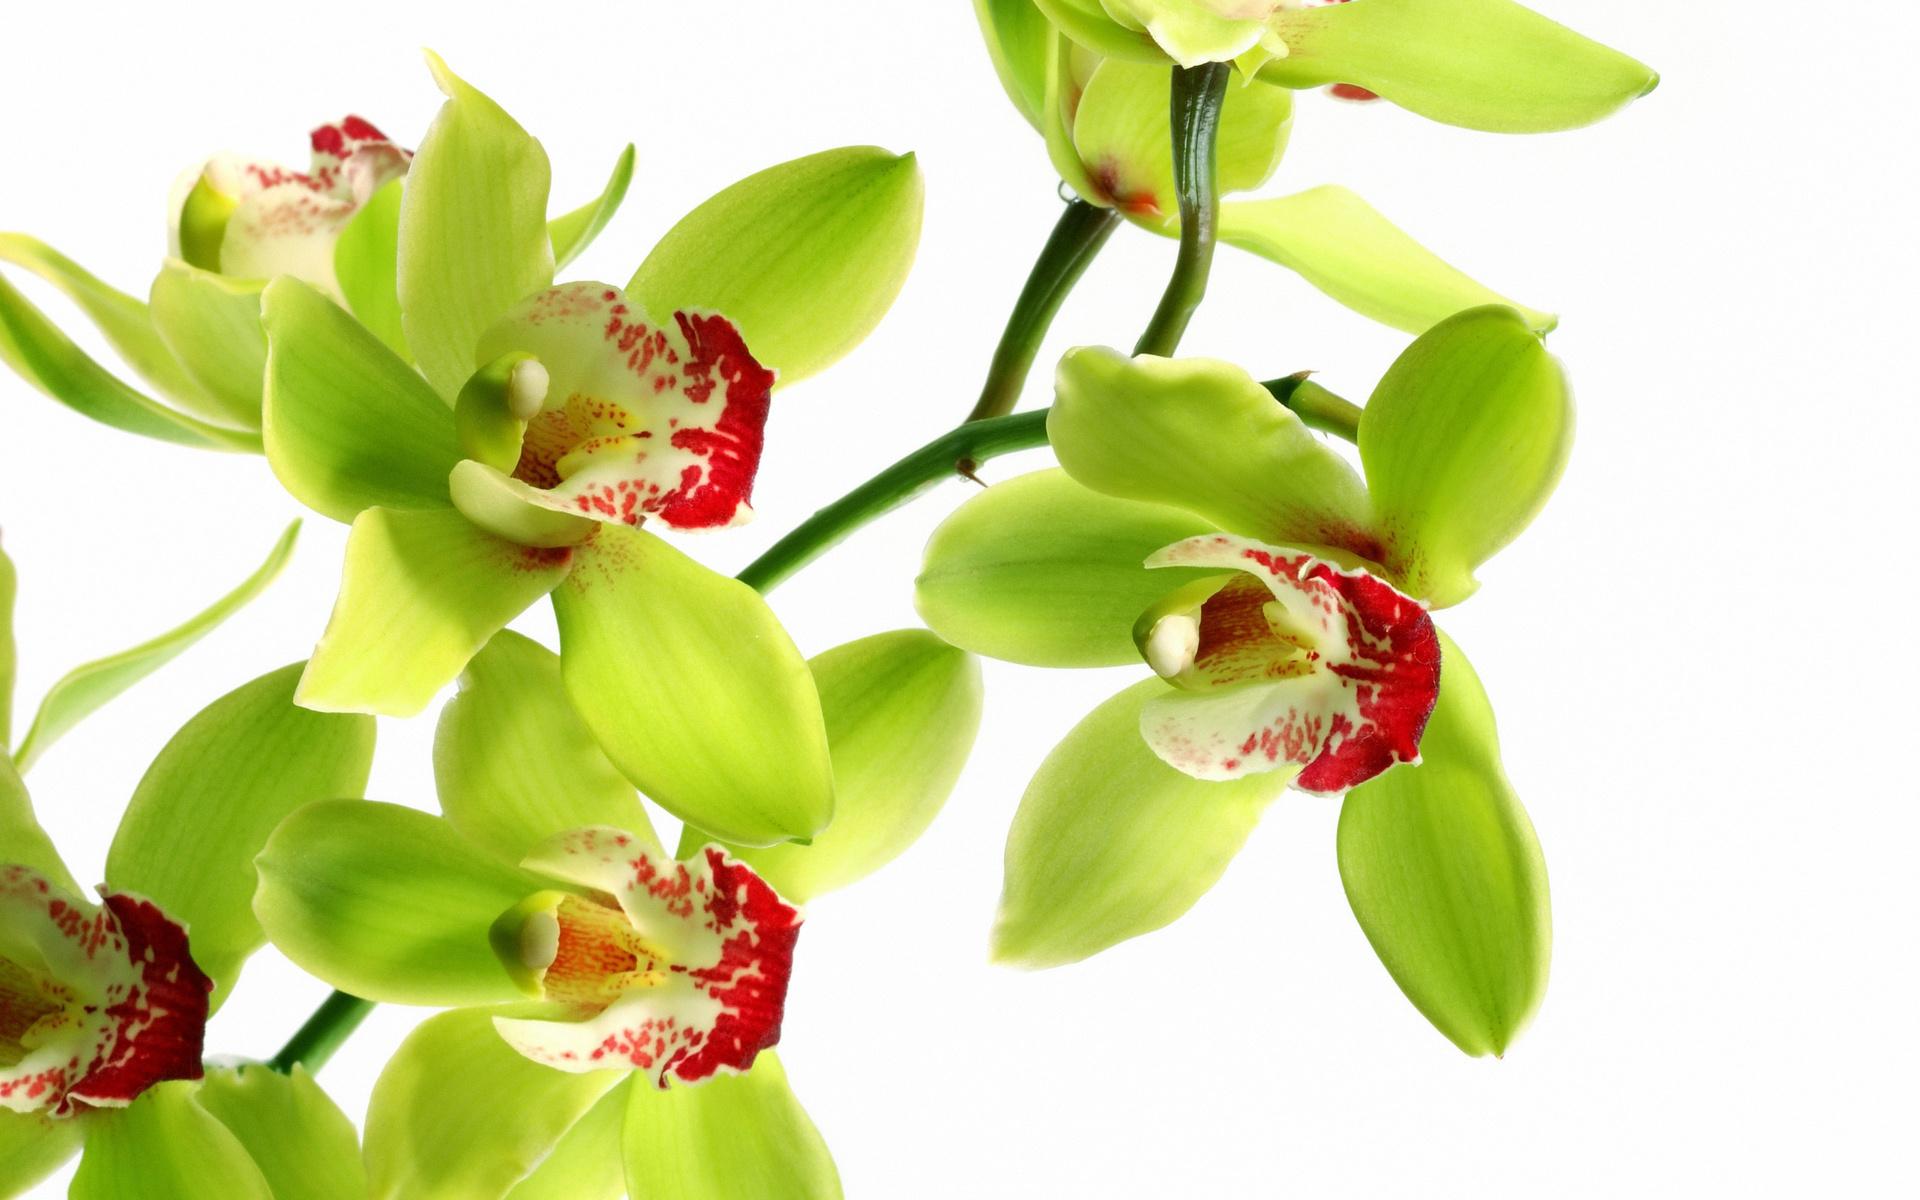 Shenzhen Nongke Orchid Wallpapers HD